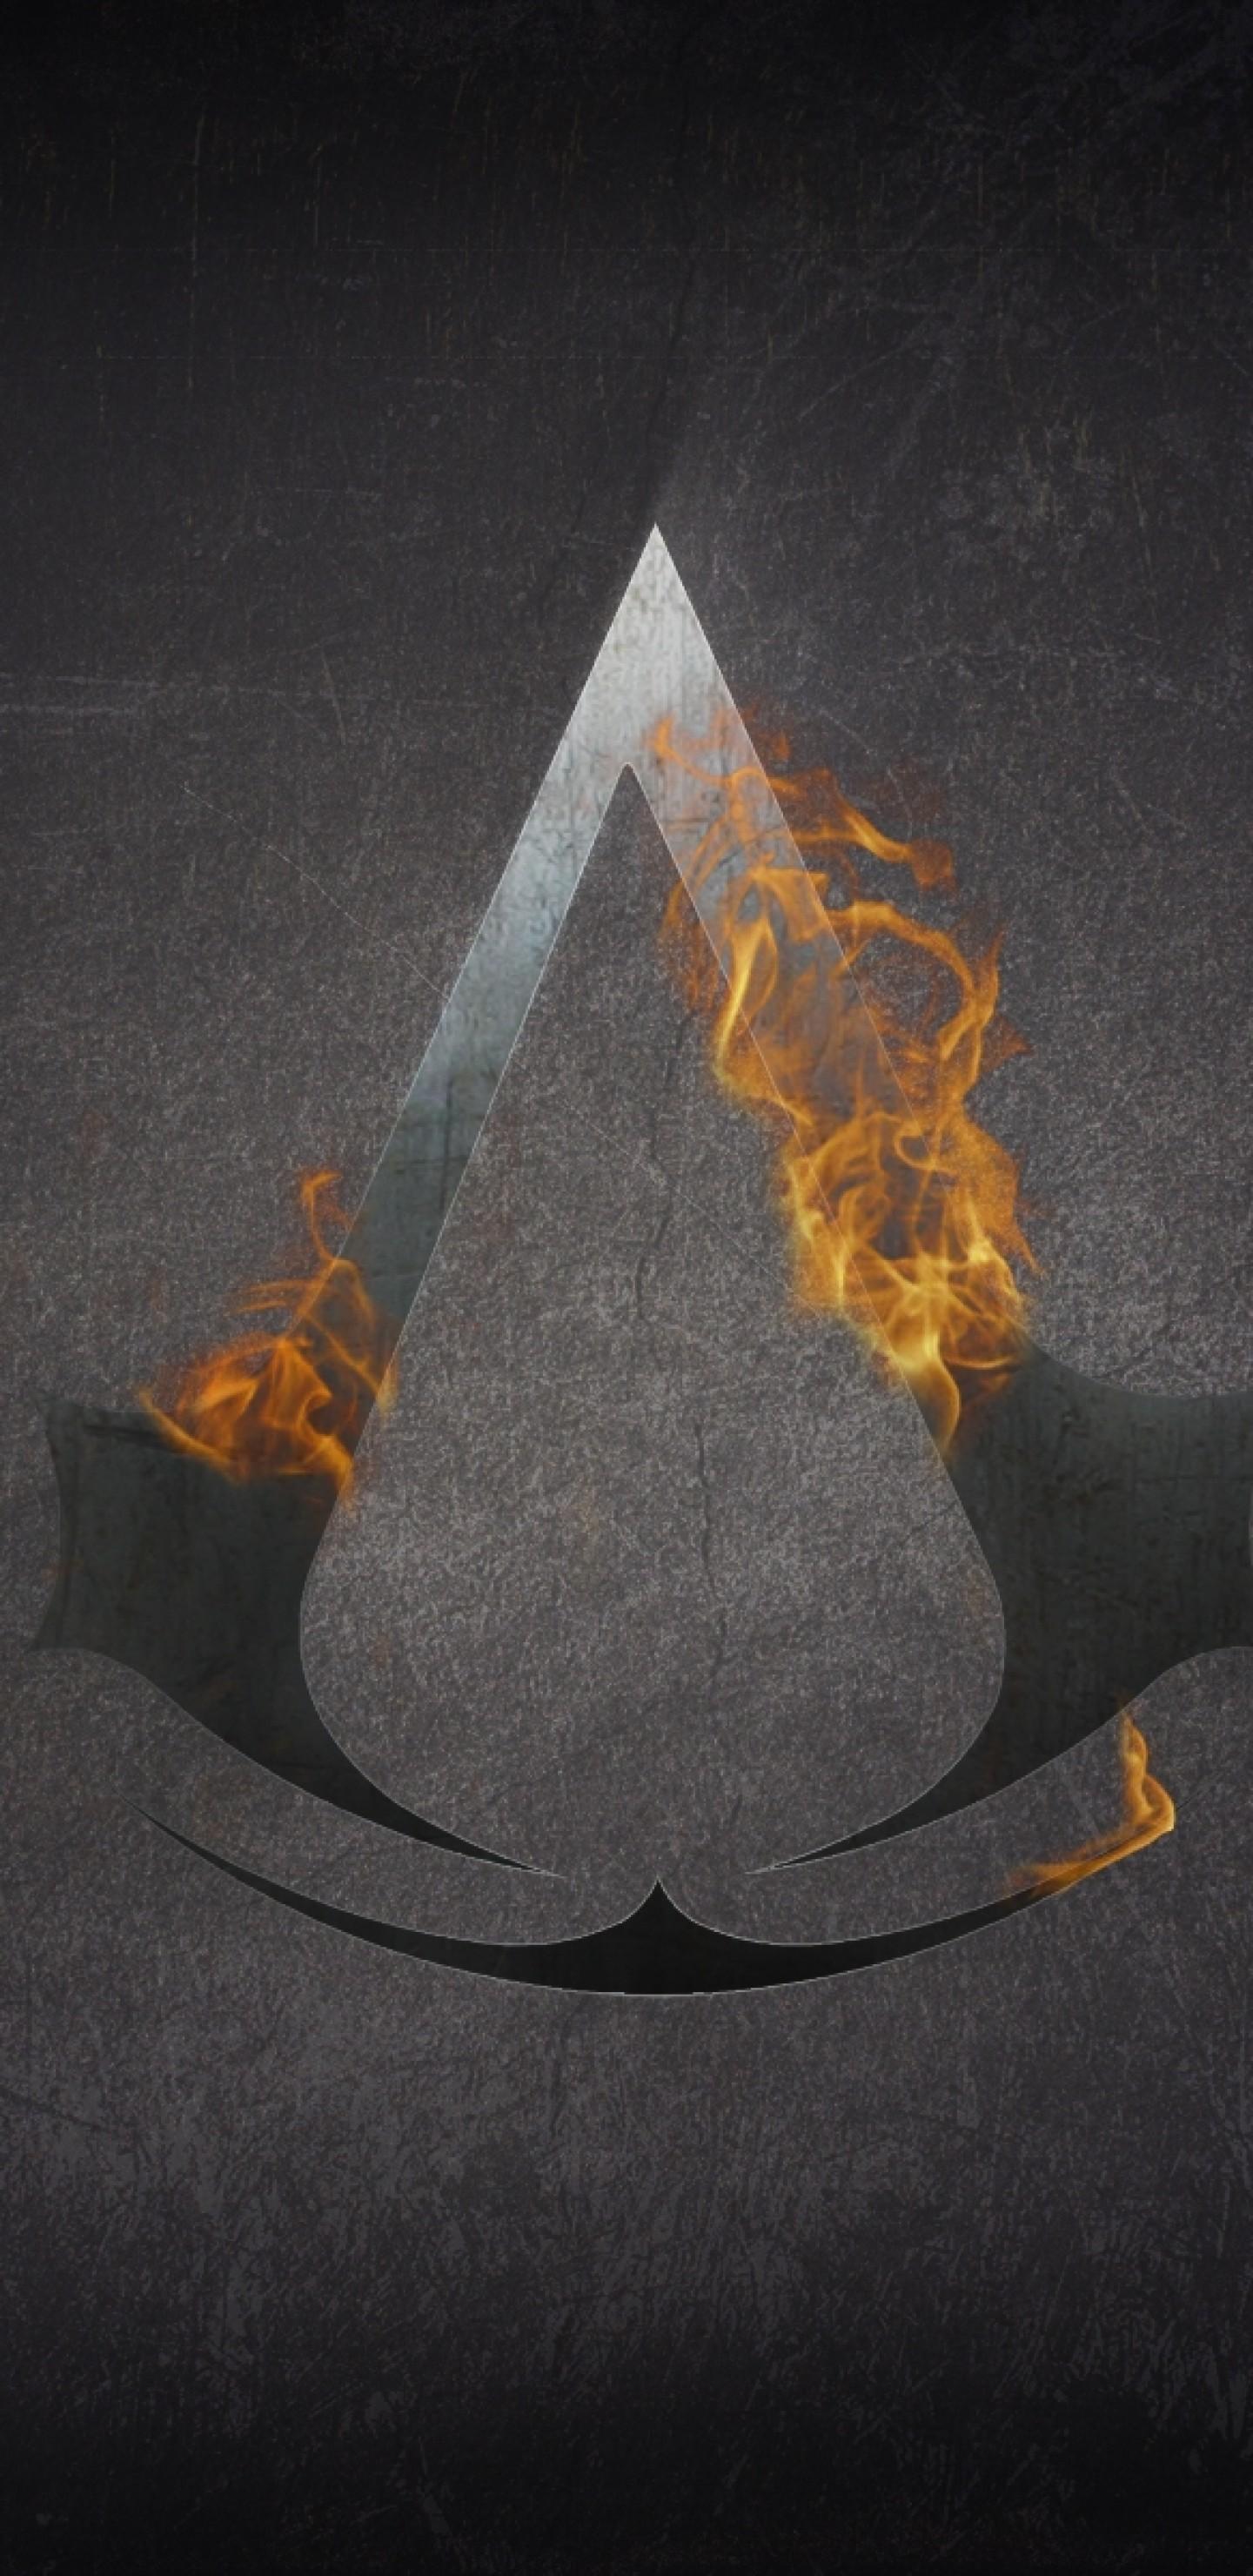 Assassin's Creed, Logo, Fire